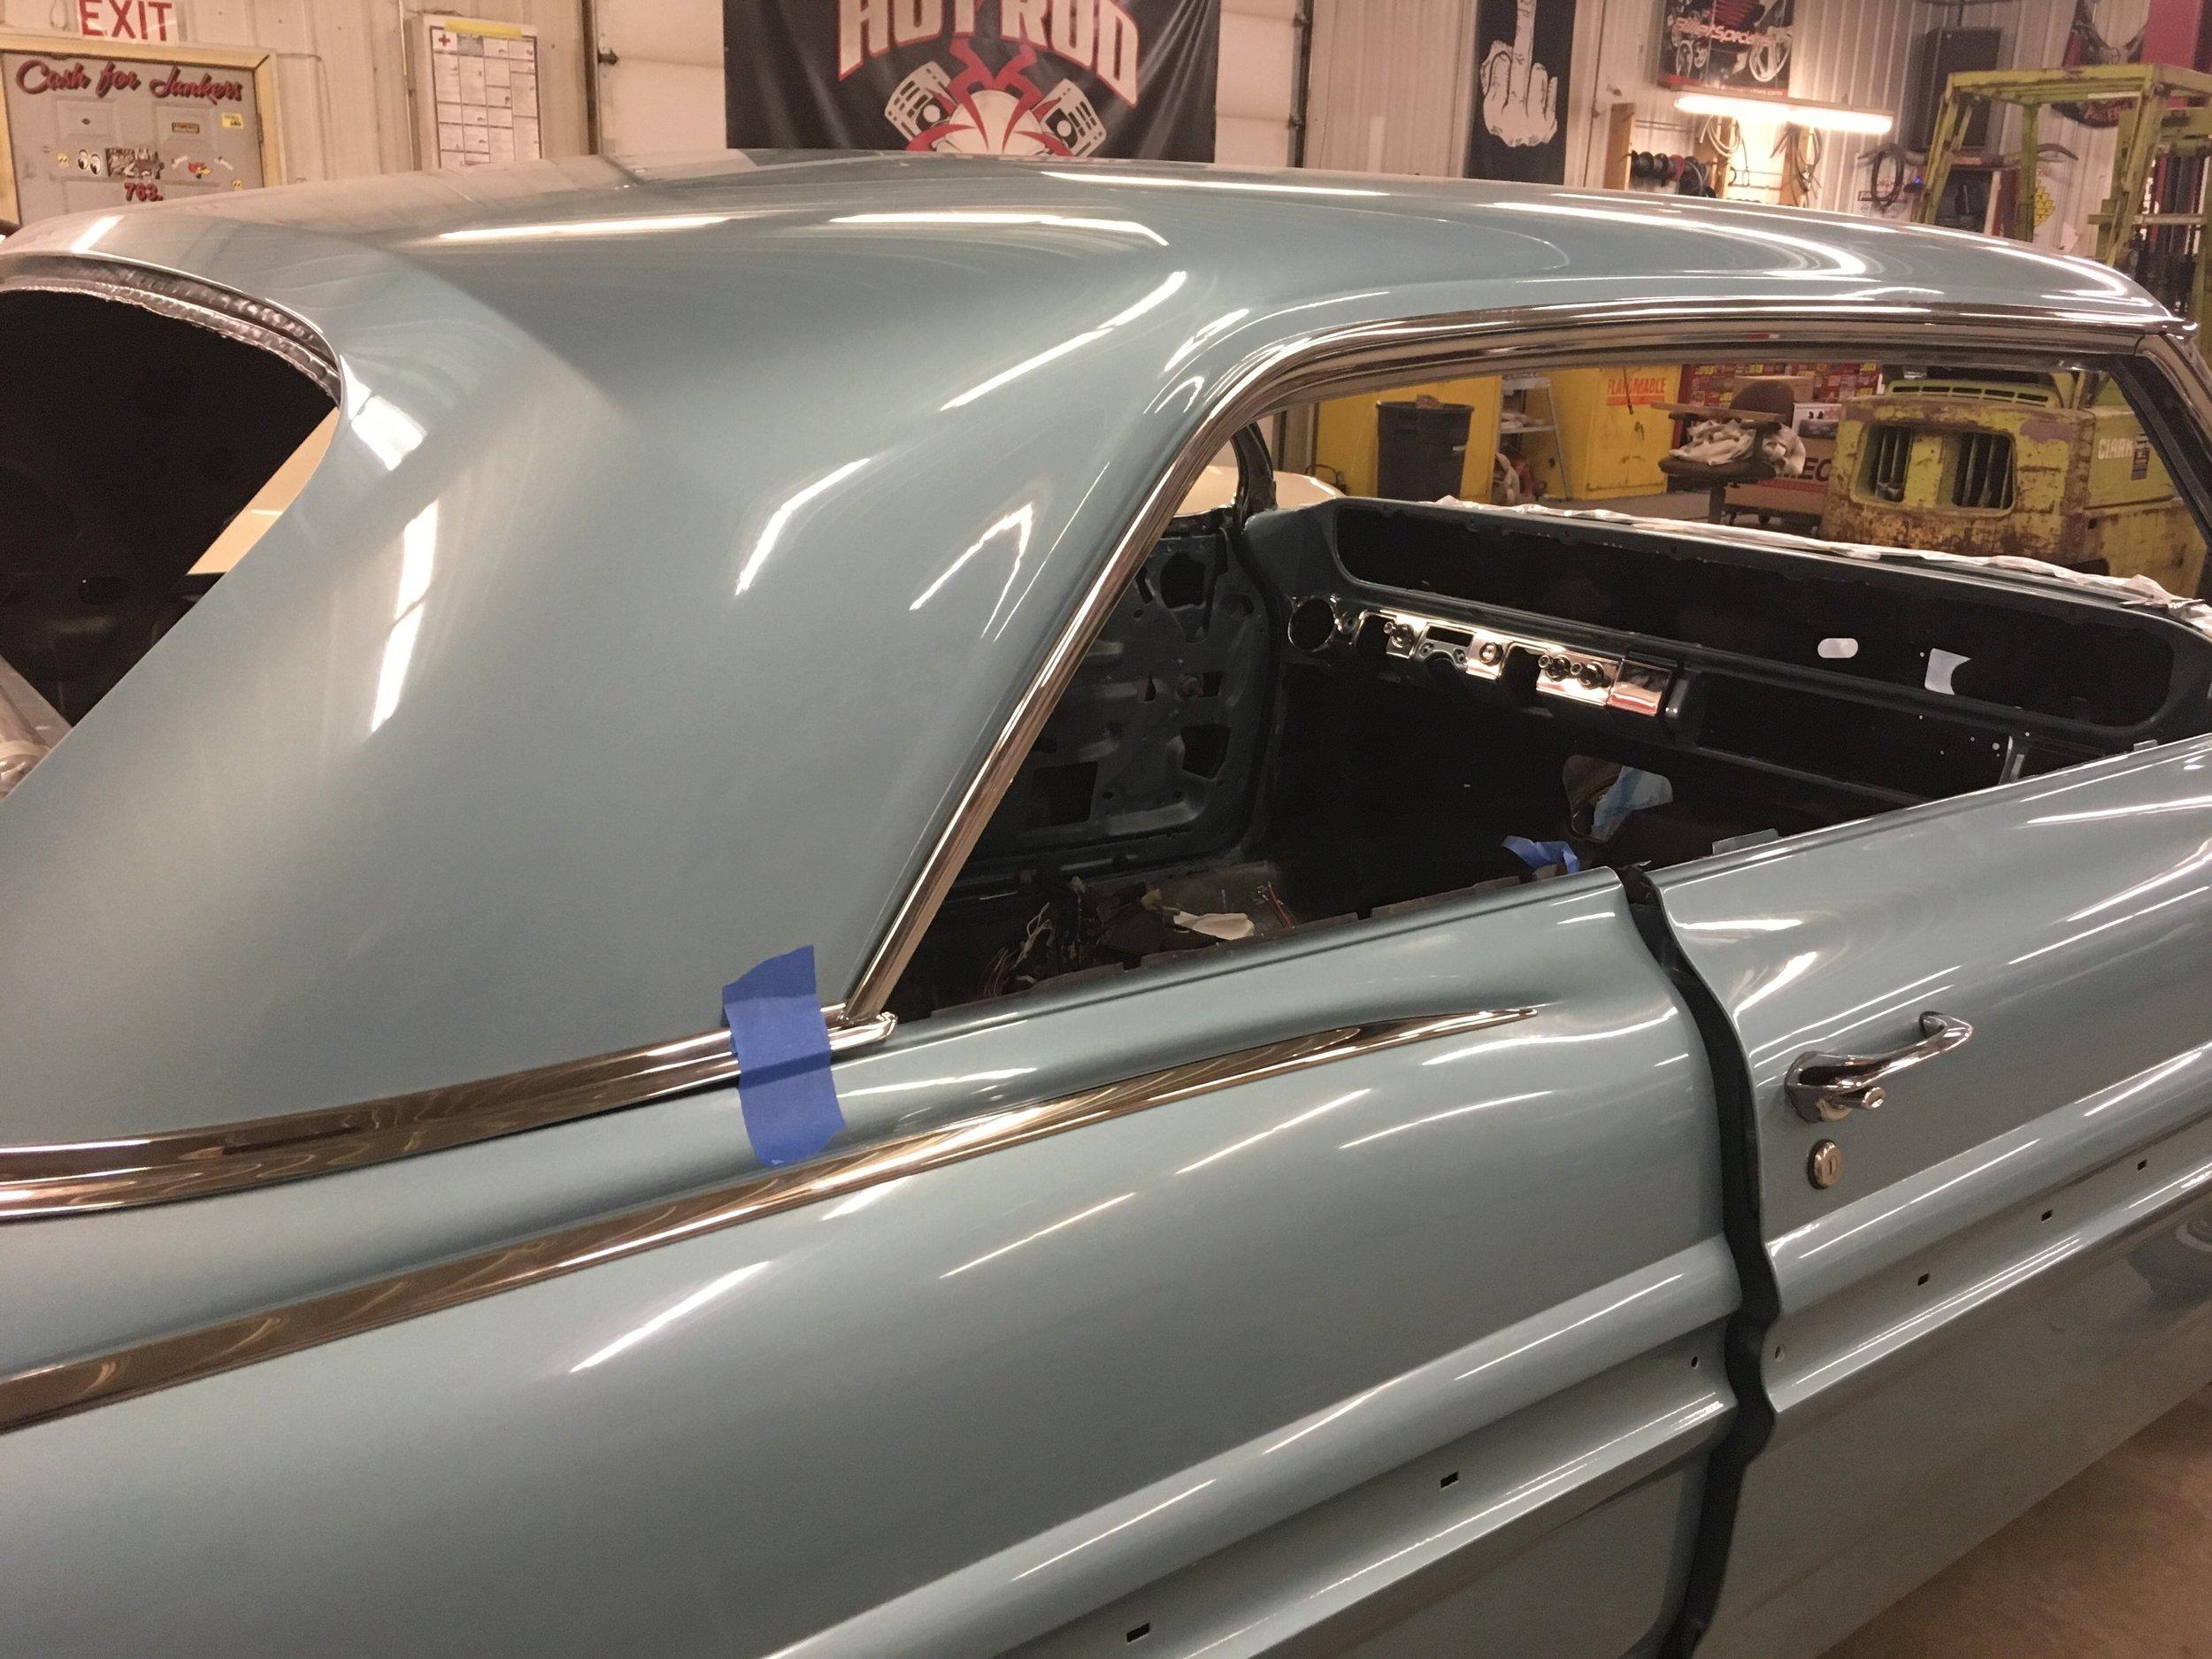 1962-pontiac-bonneville-minneapolis-hot-rod-custom-build-restoration-32.jpg